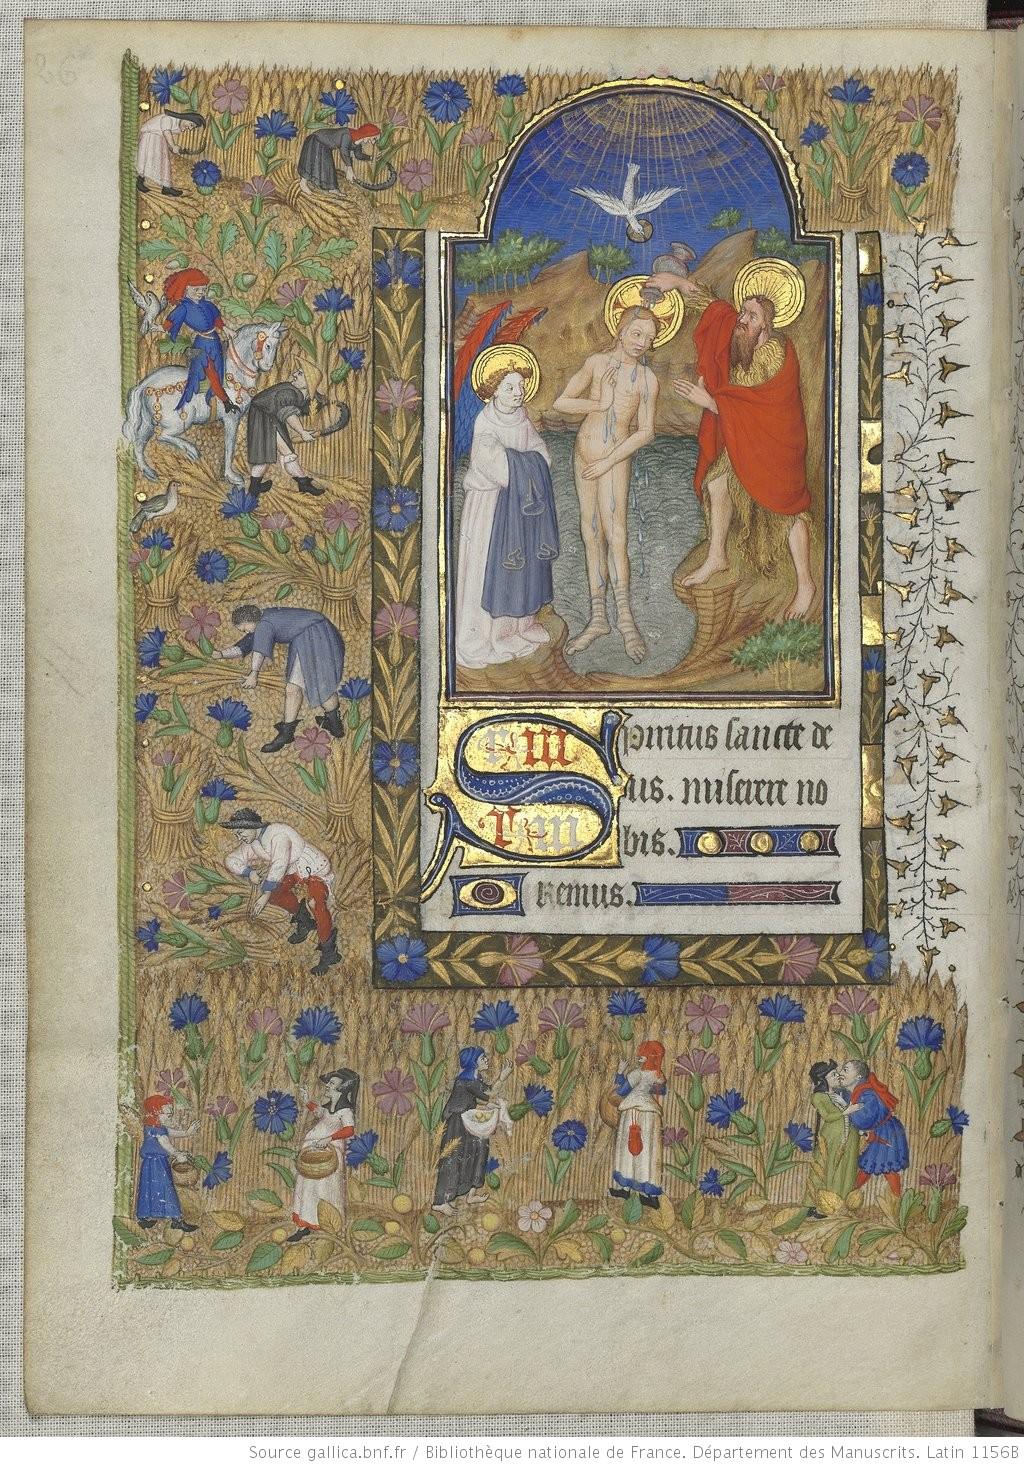 Heures de Marguerite d'Orleans 1430 ca BNF Latin 1156B fol 161v Gallica